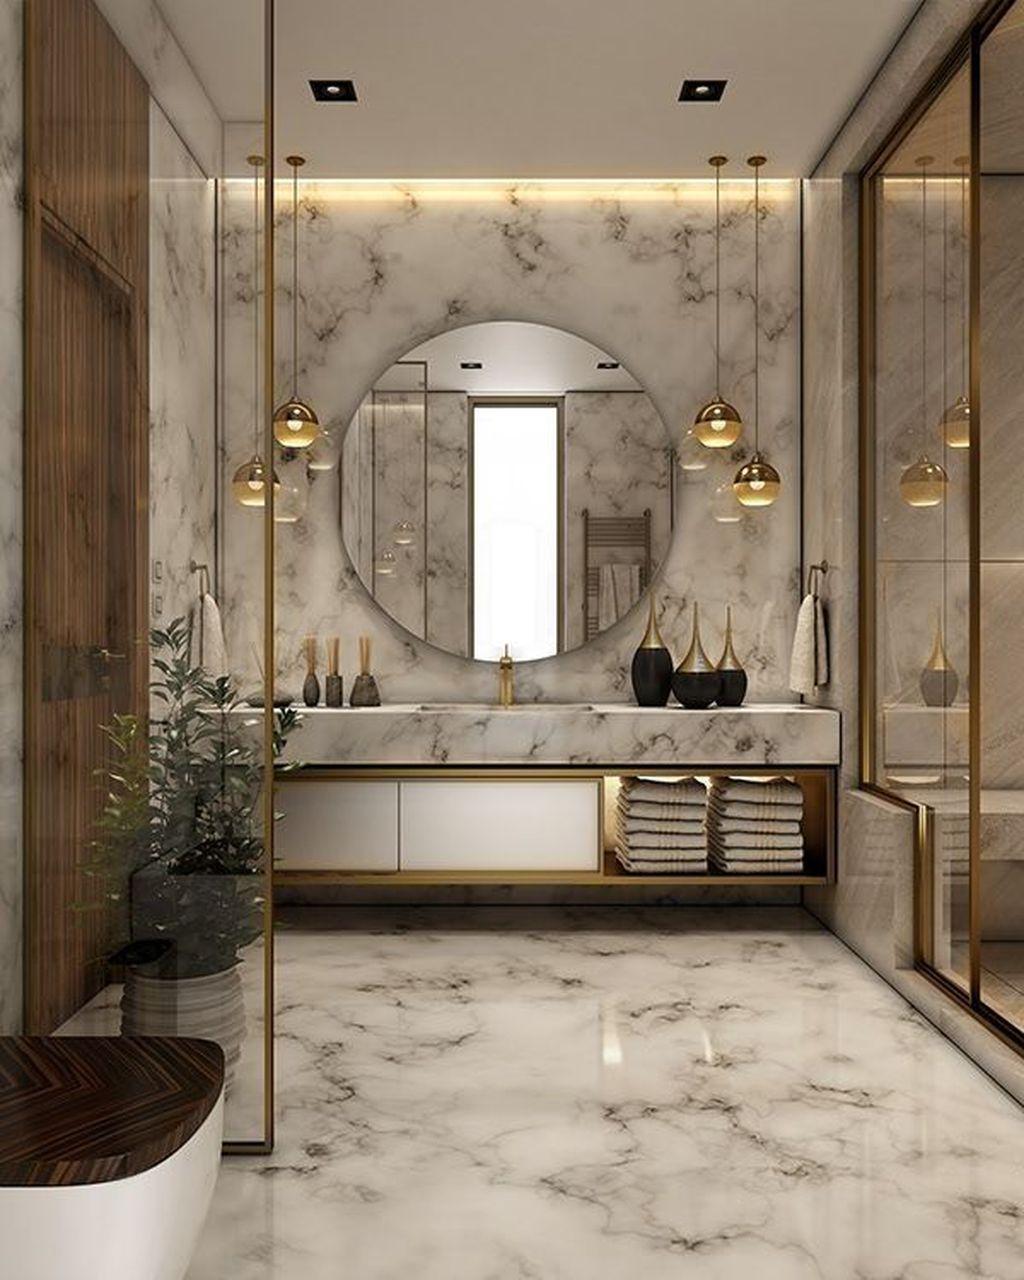 Latest Bathroom Design Ideas To Try Asap 10